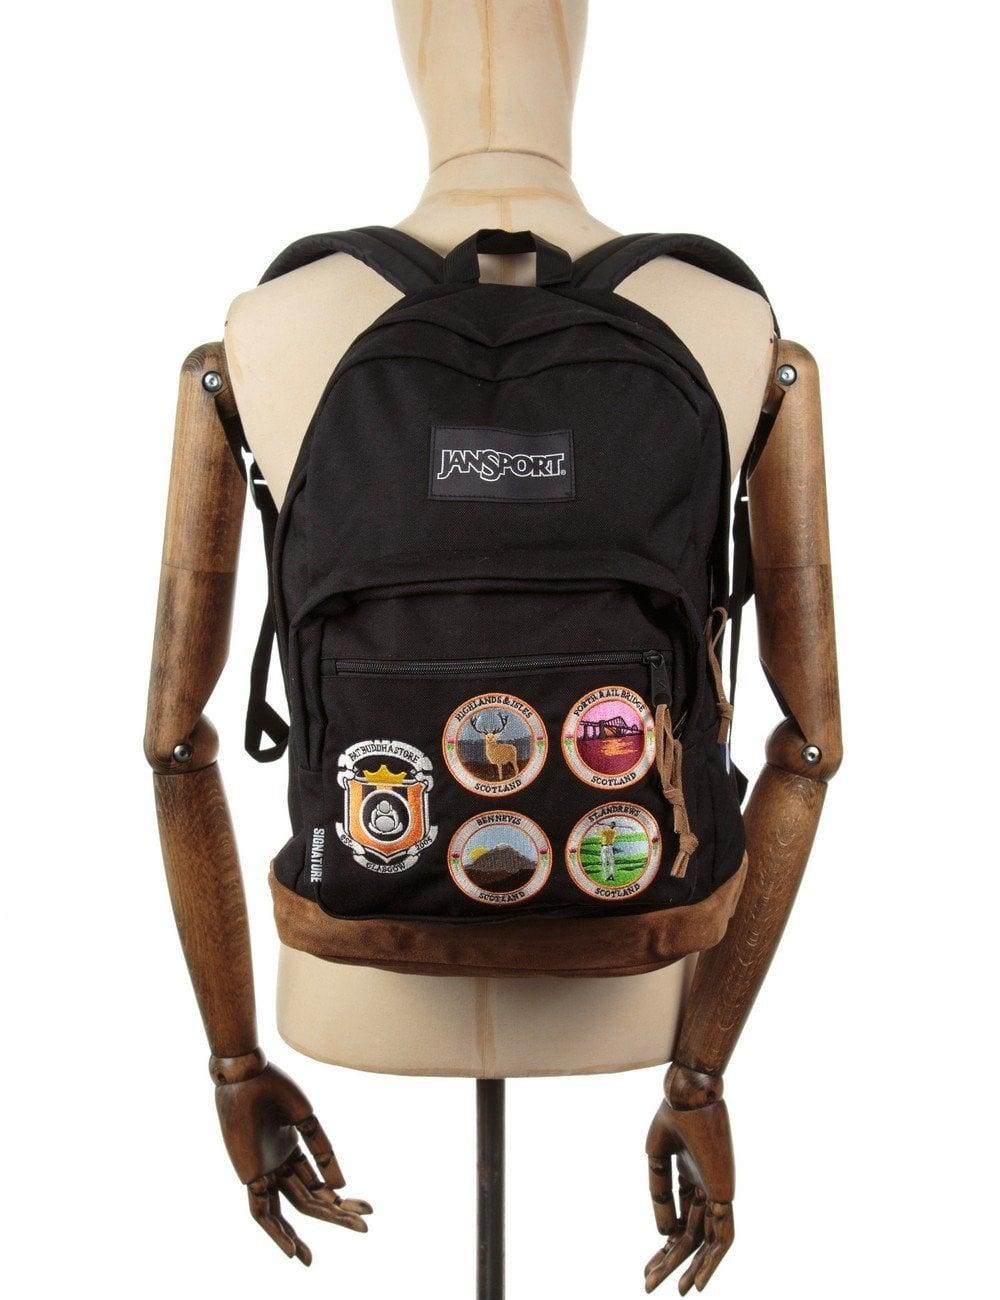 0fec168e3277 Jansport Heritage X Fat Buddha Store Rightpack Backpack - Black ...